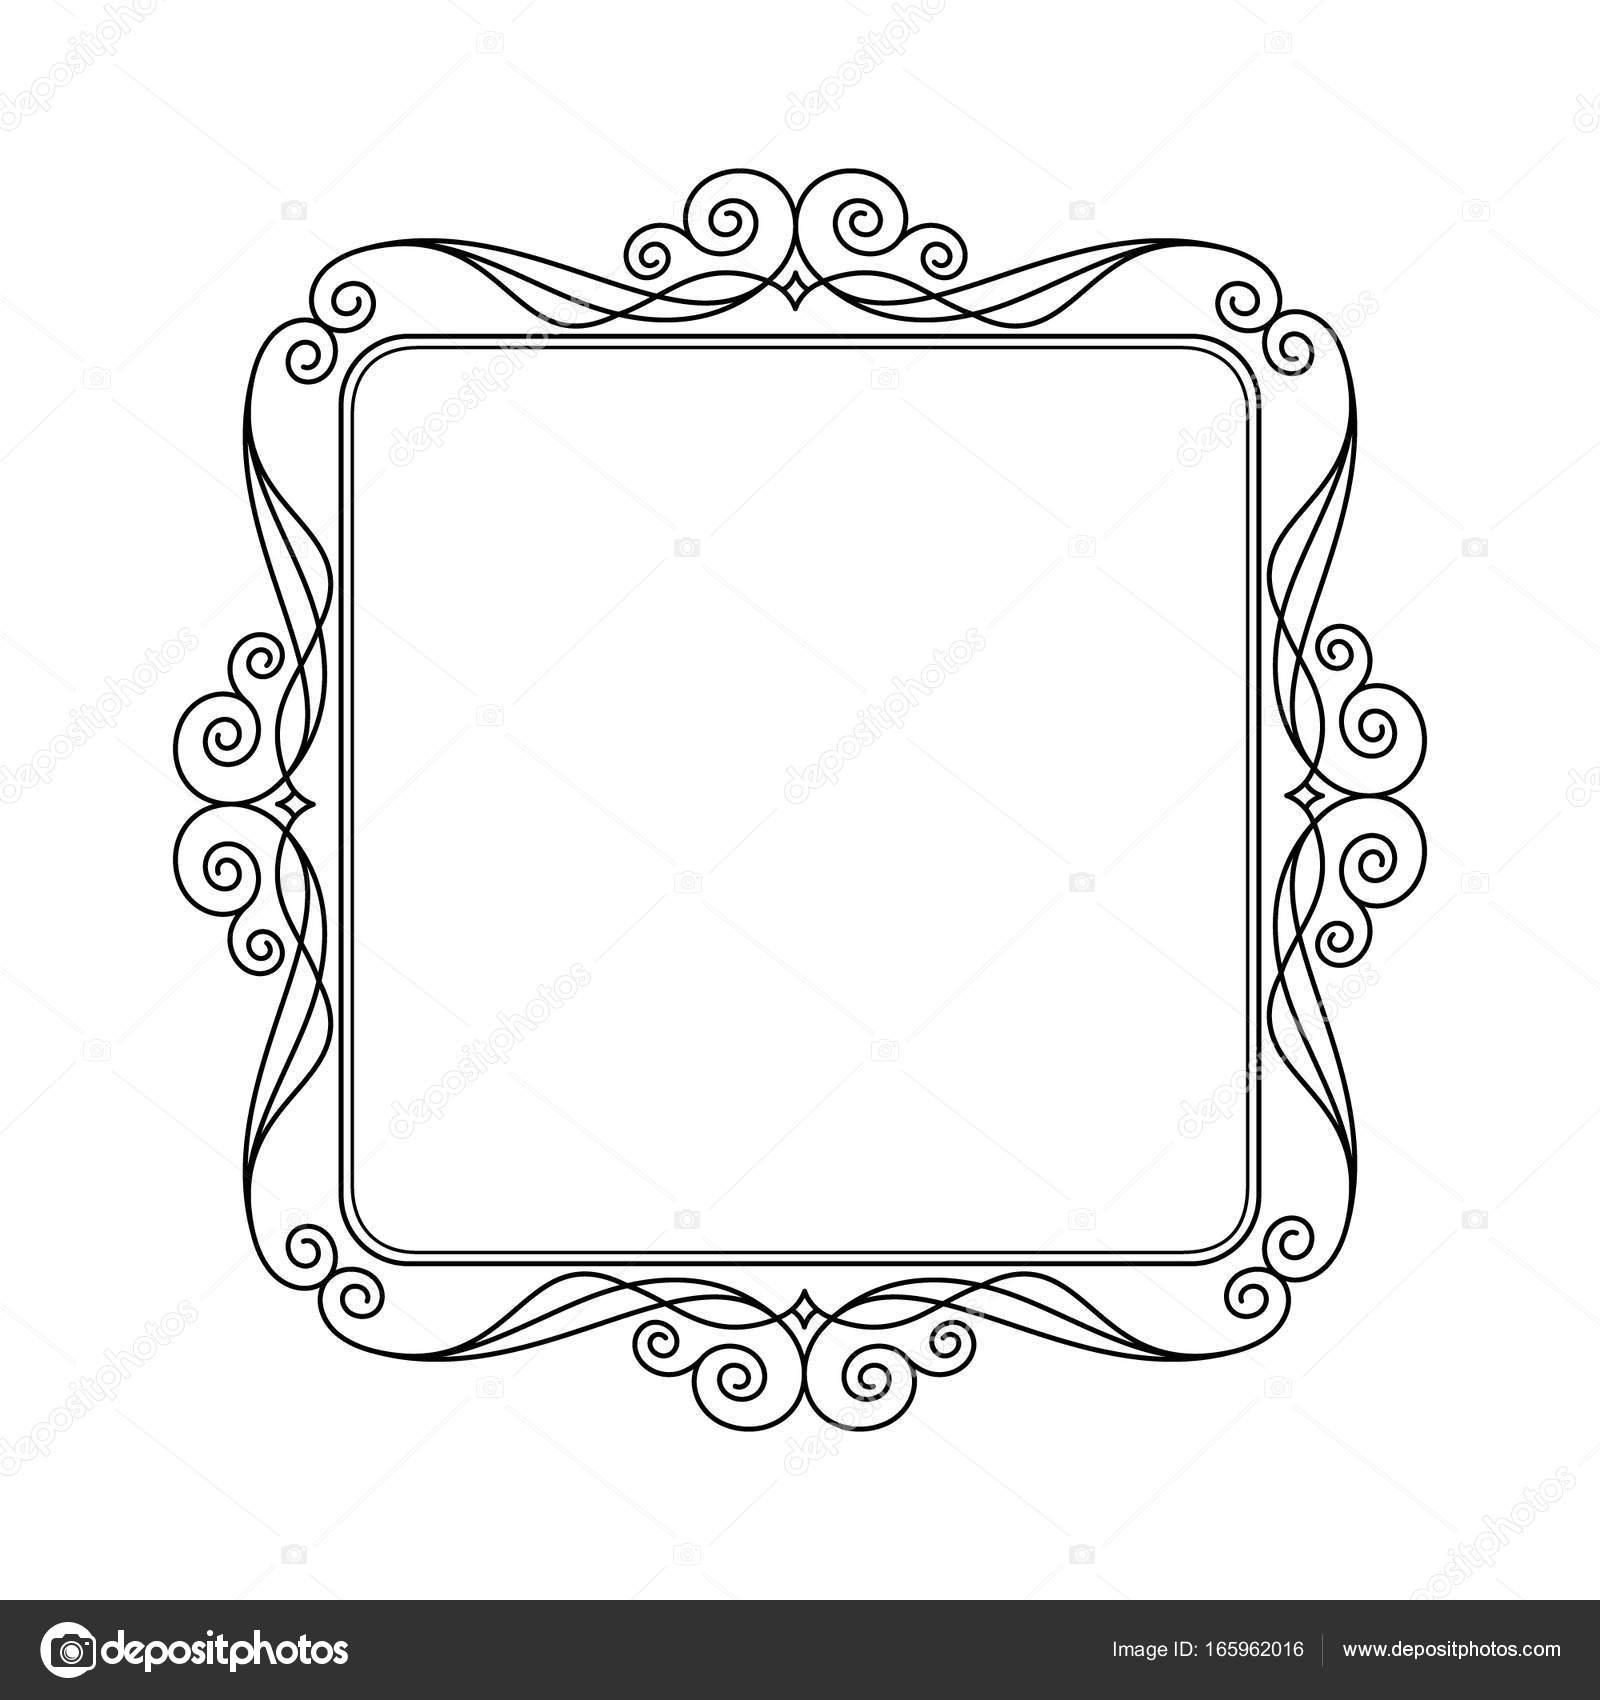 Vektor Retro-Rahmen. Vektor-Illustration. Schwarz — Stockvektor ...